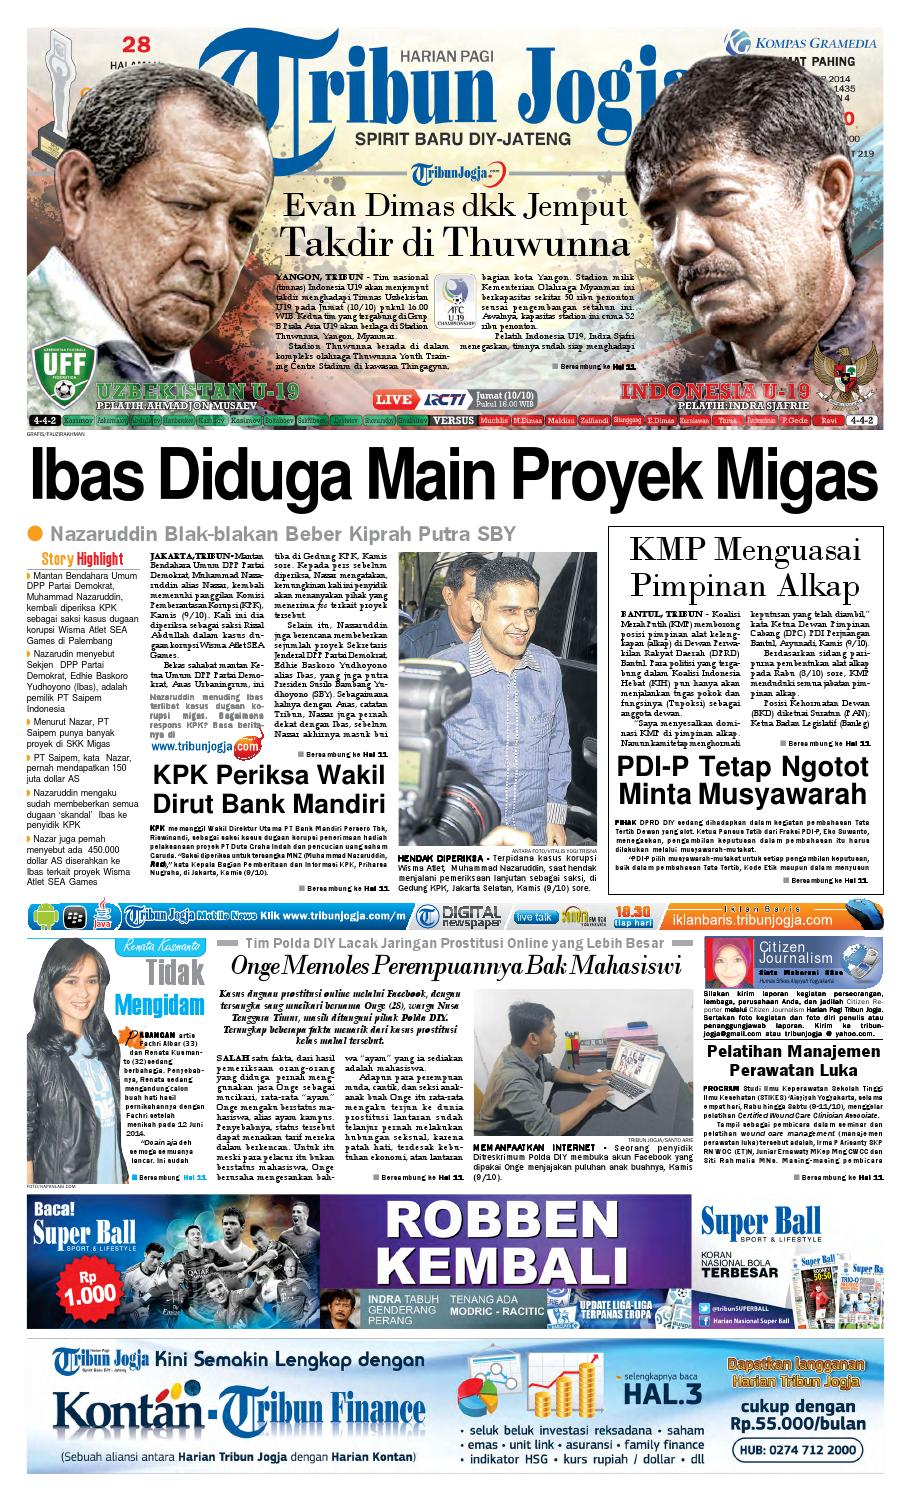 Tribunjogja 10 2014 By Tribun Jogja Issuu Produk Ukm Bumn Barbekyu Kelitik Surabaya